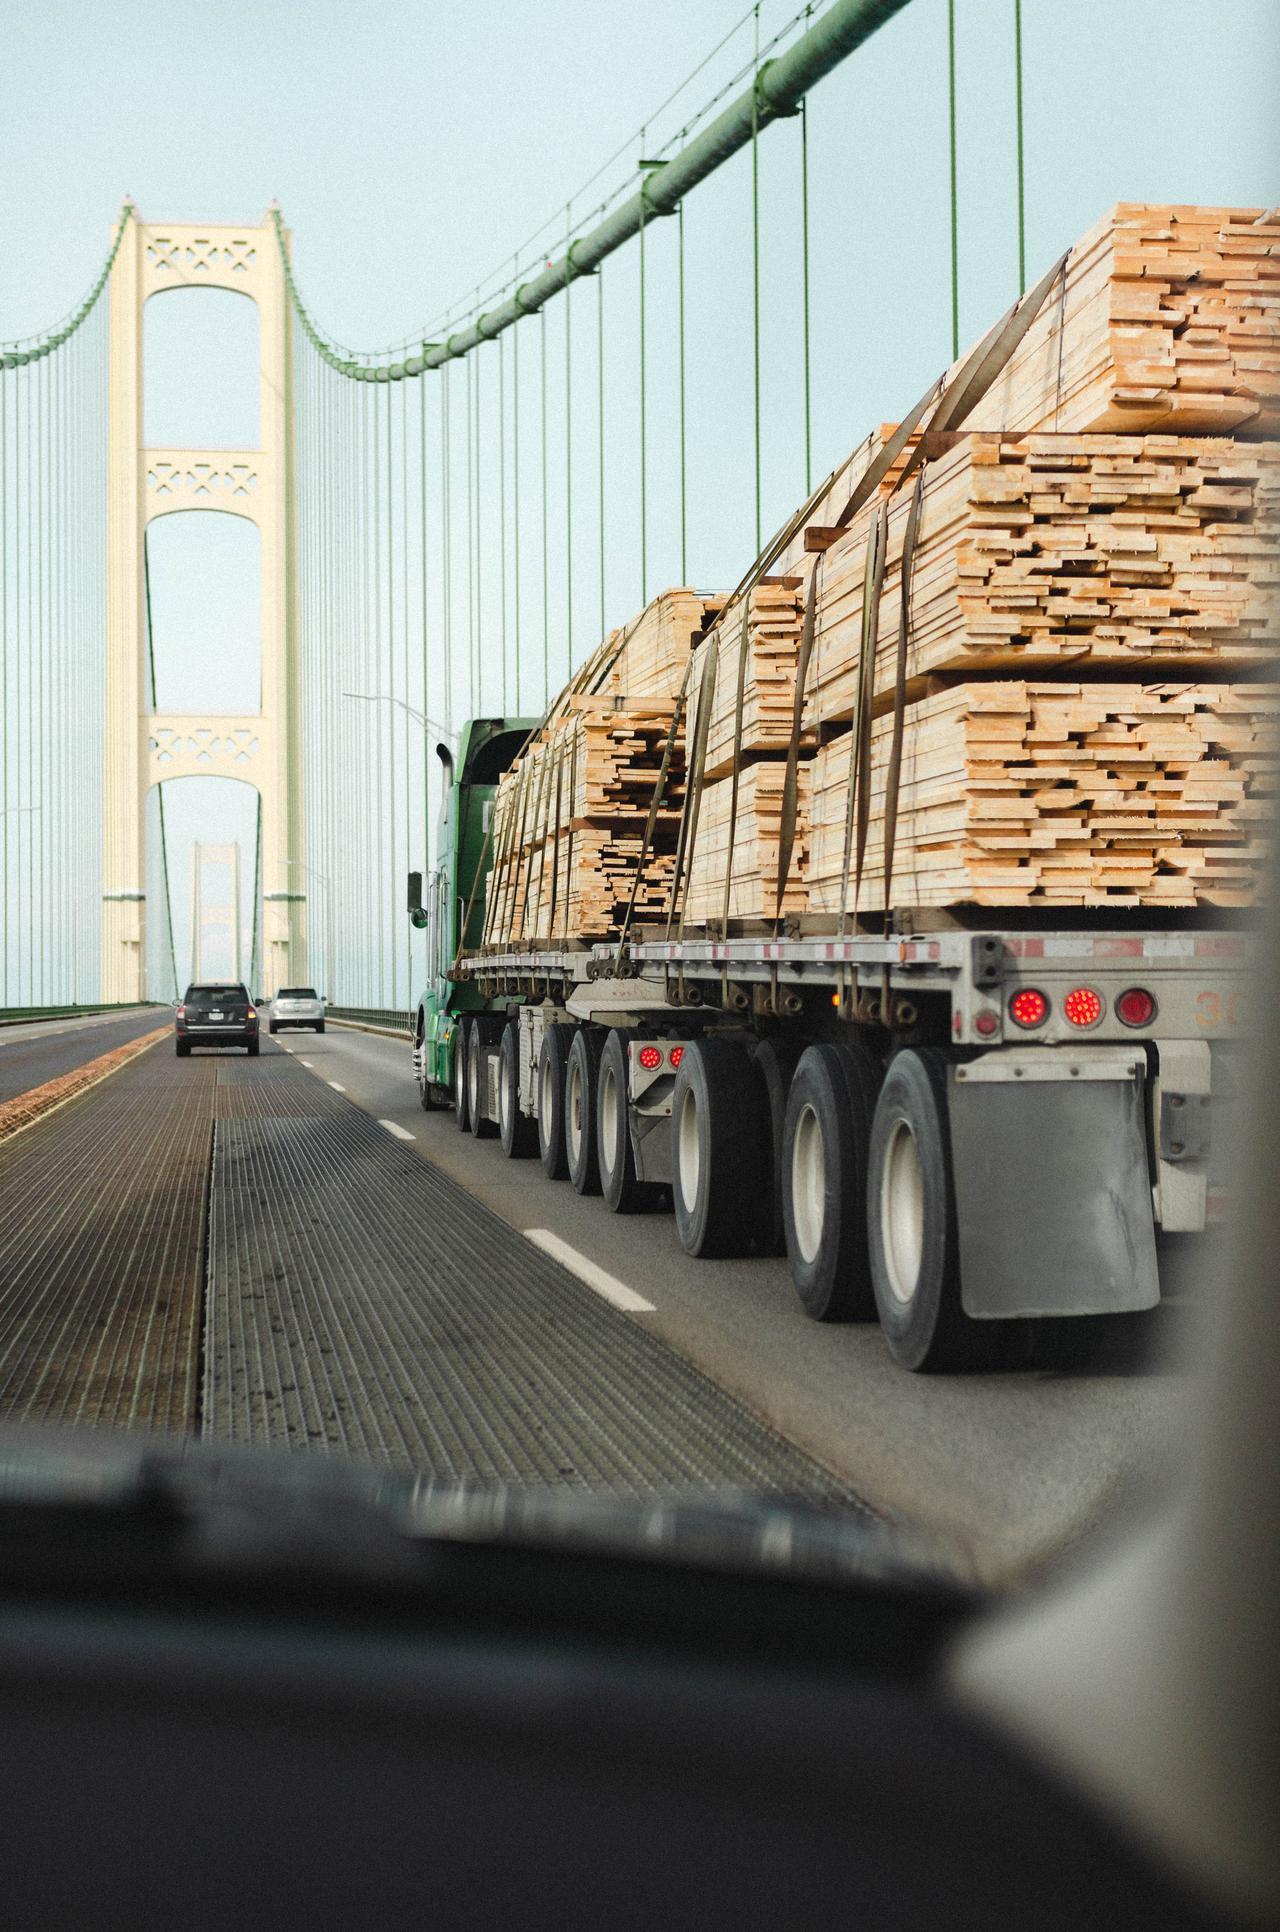 lumber truck on a bridge